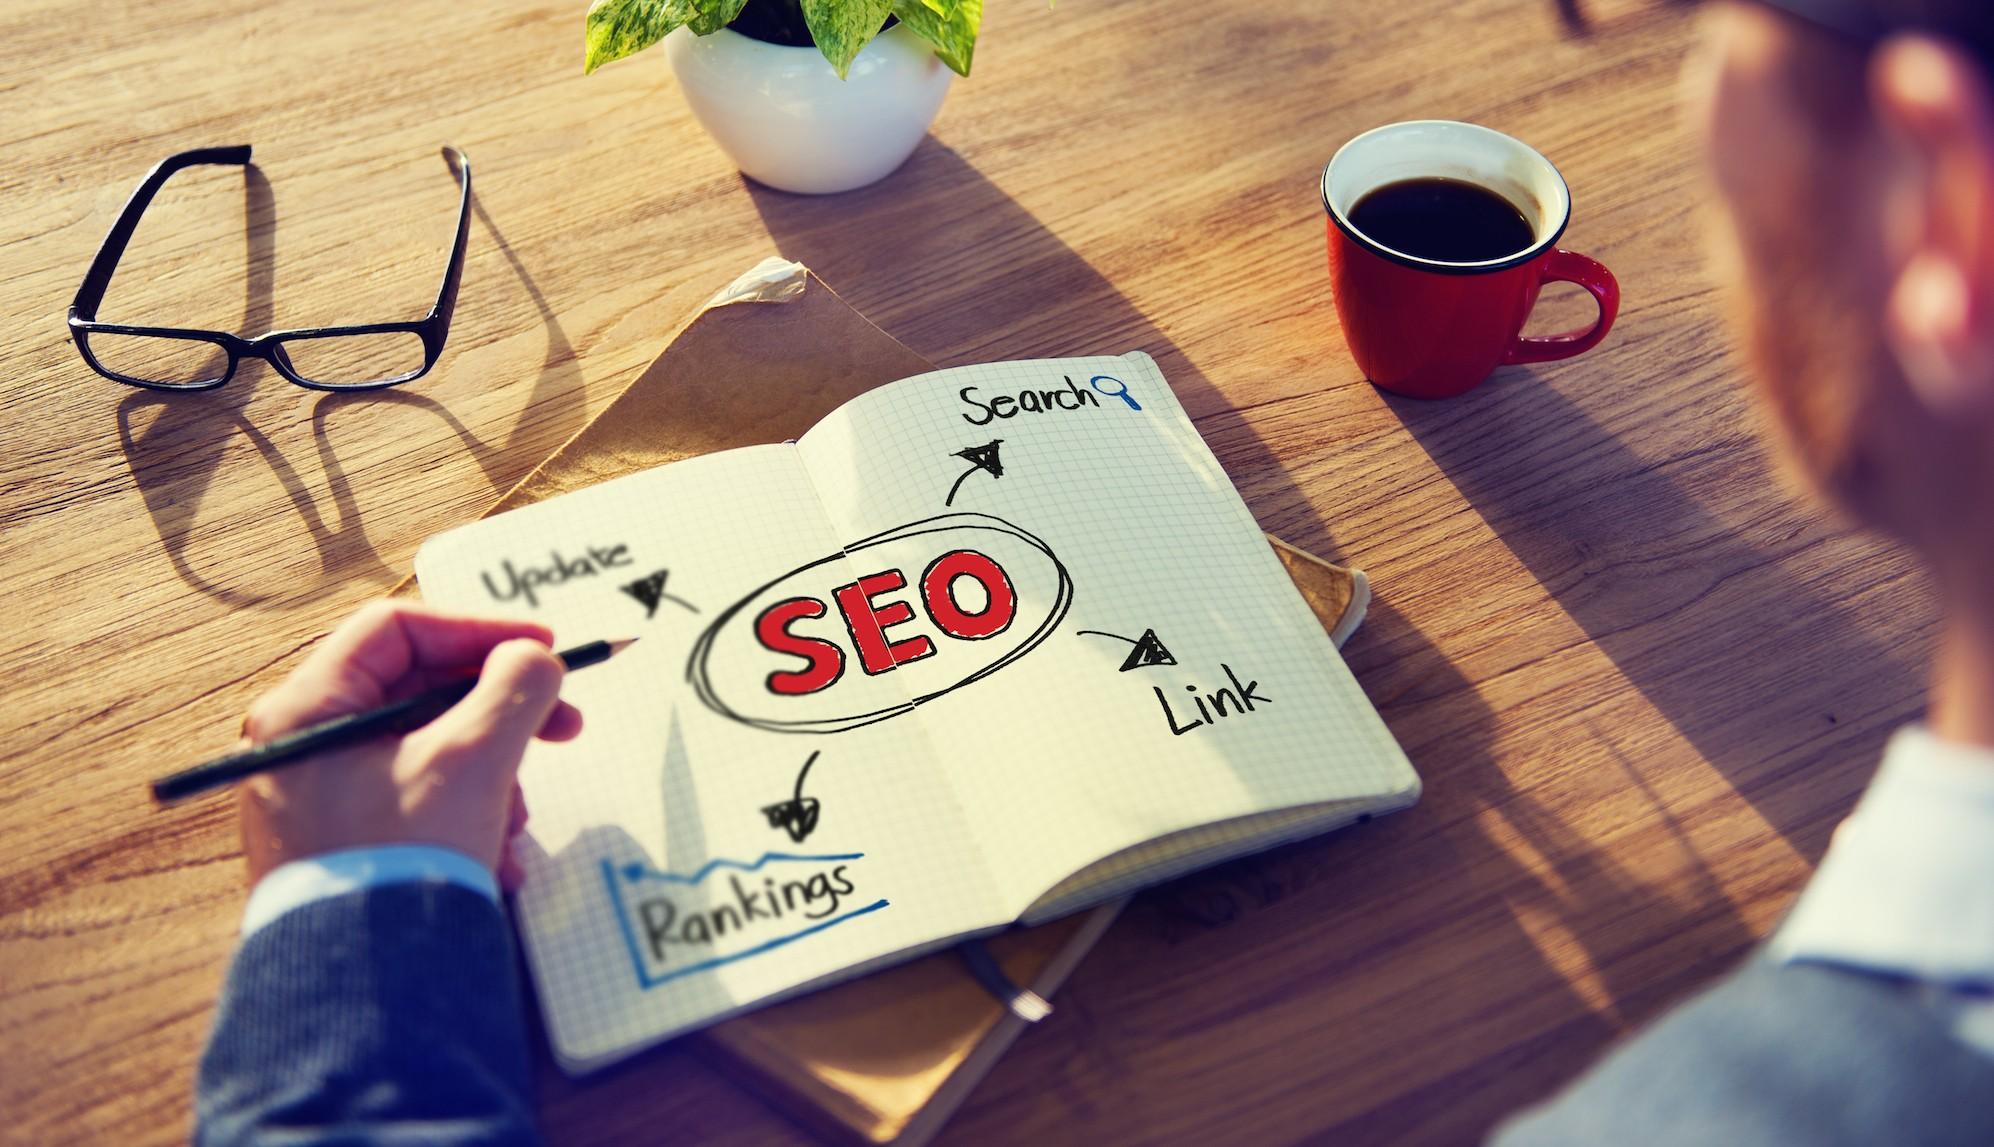 6 bước tối ưu giúp web chuẩn Google